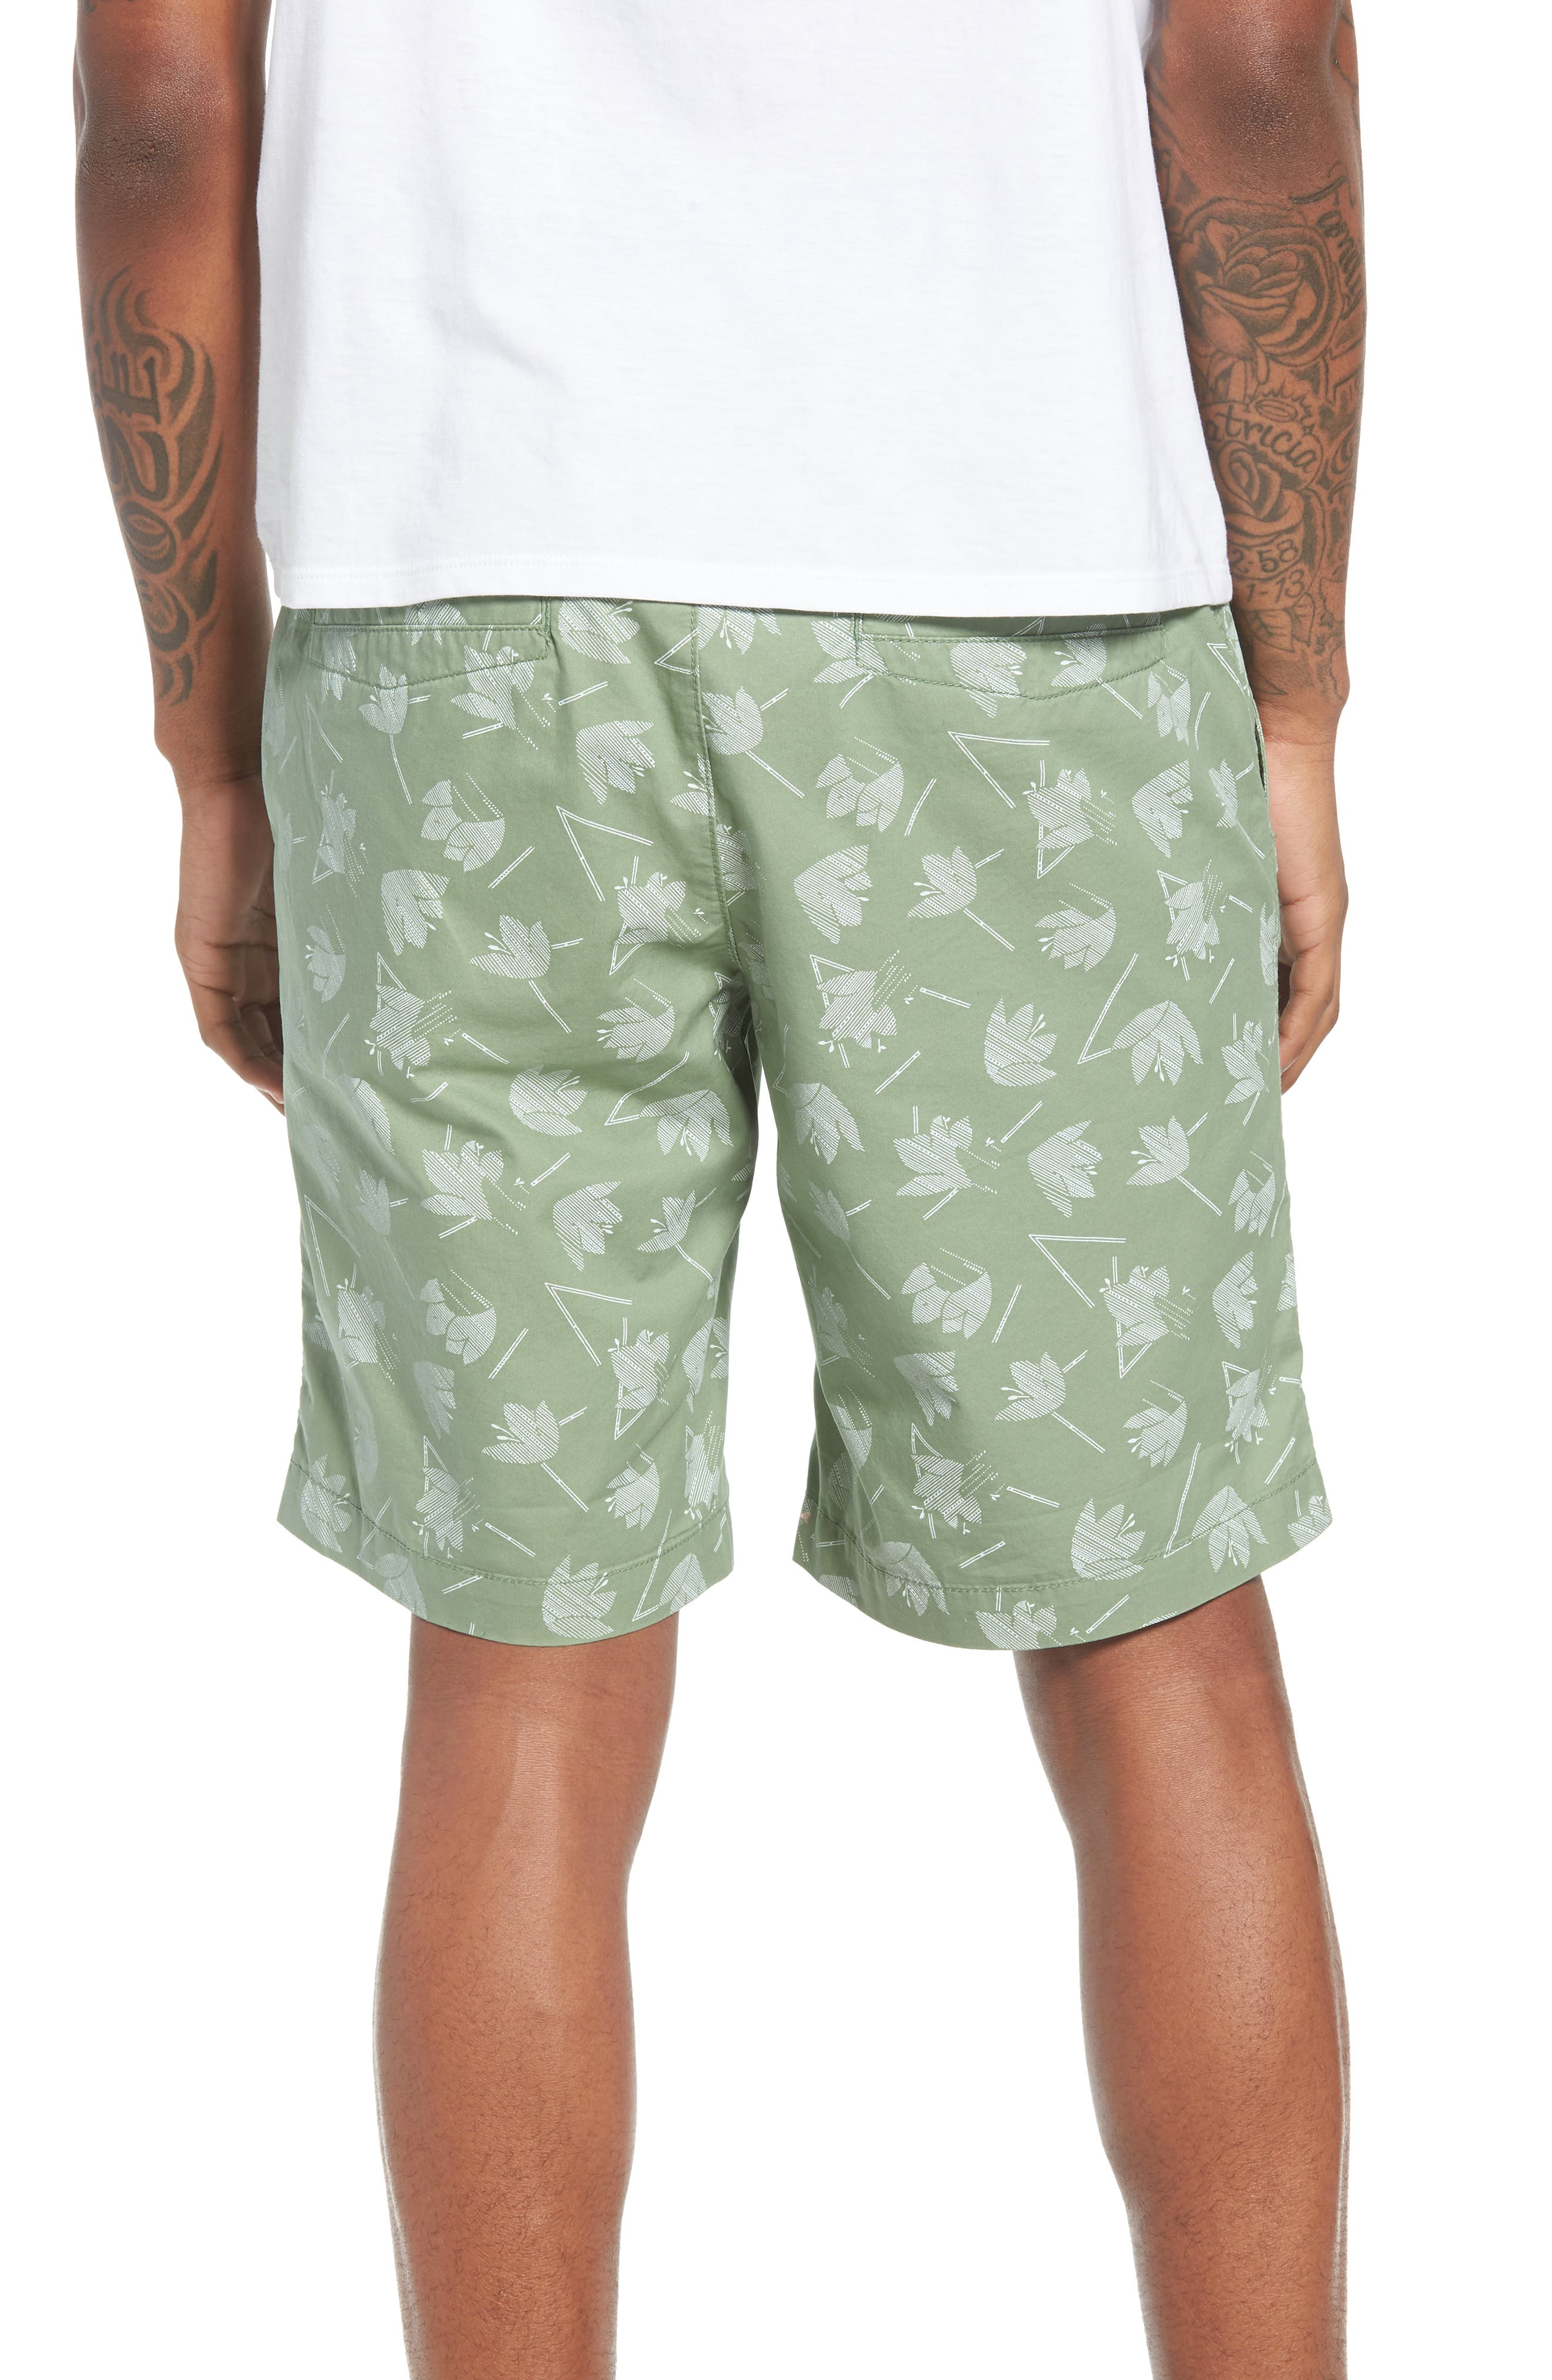 Deco Floral Print Shorts,                             Alternate thumbnail 2, color,                             Green Hedge Deco Floral